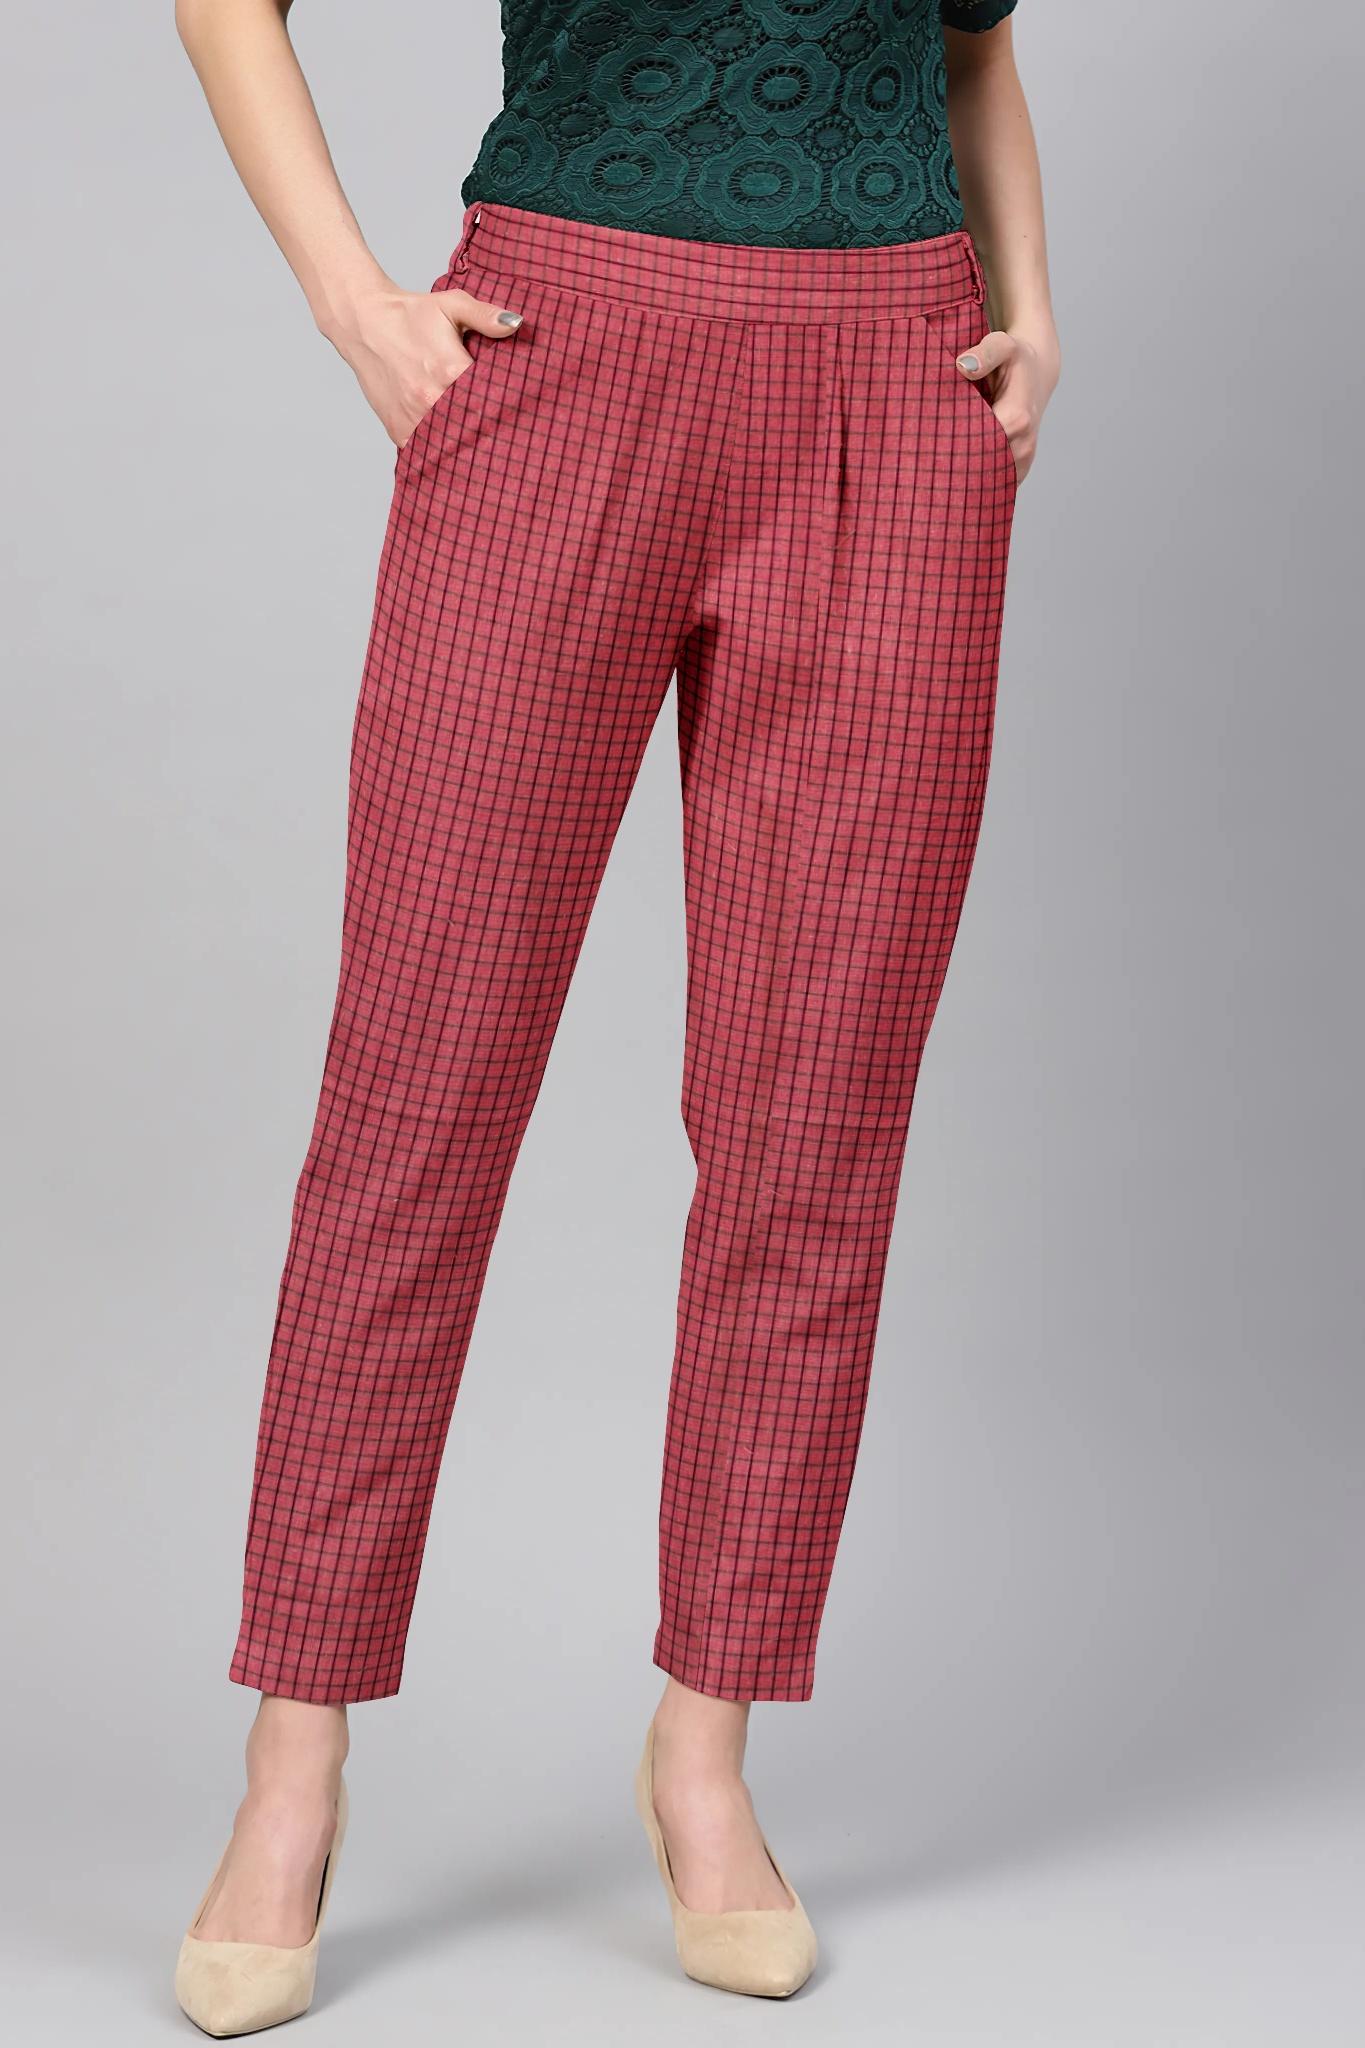 /home/customer/www/fabartcraft.com/public_html/uploadshttps://www.shopolics.com/uploads/images/medium/Red-Maroon-Cotton-Check-Regular-Fit-Solid-Trouser-36108.jpg